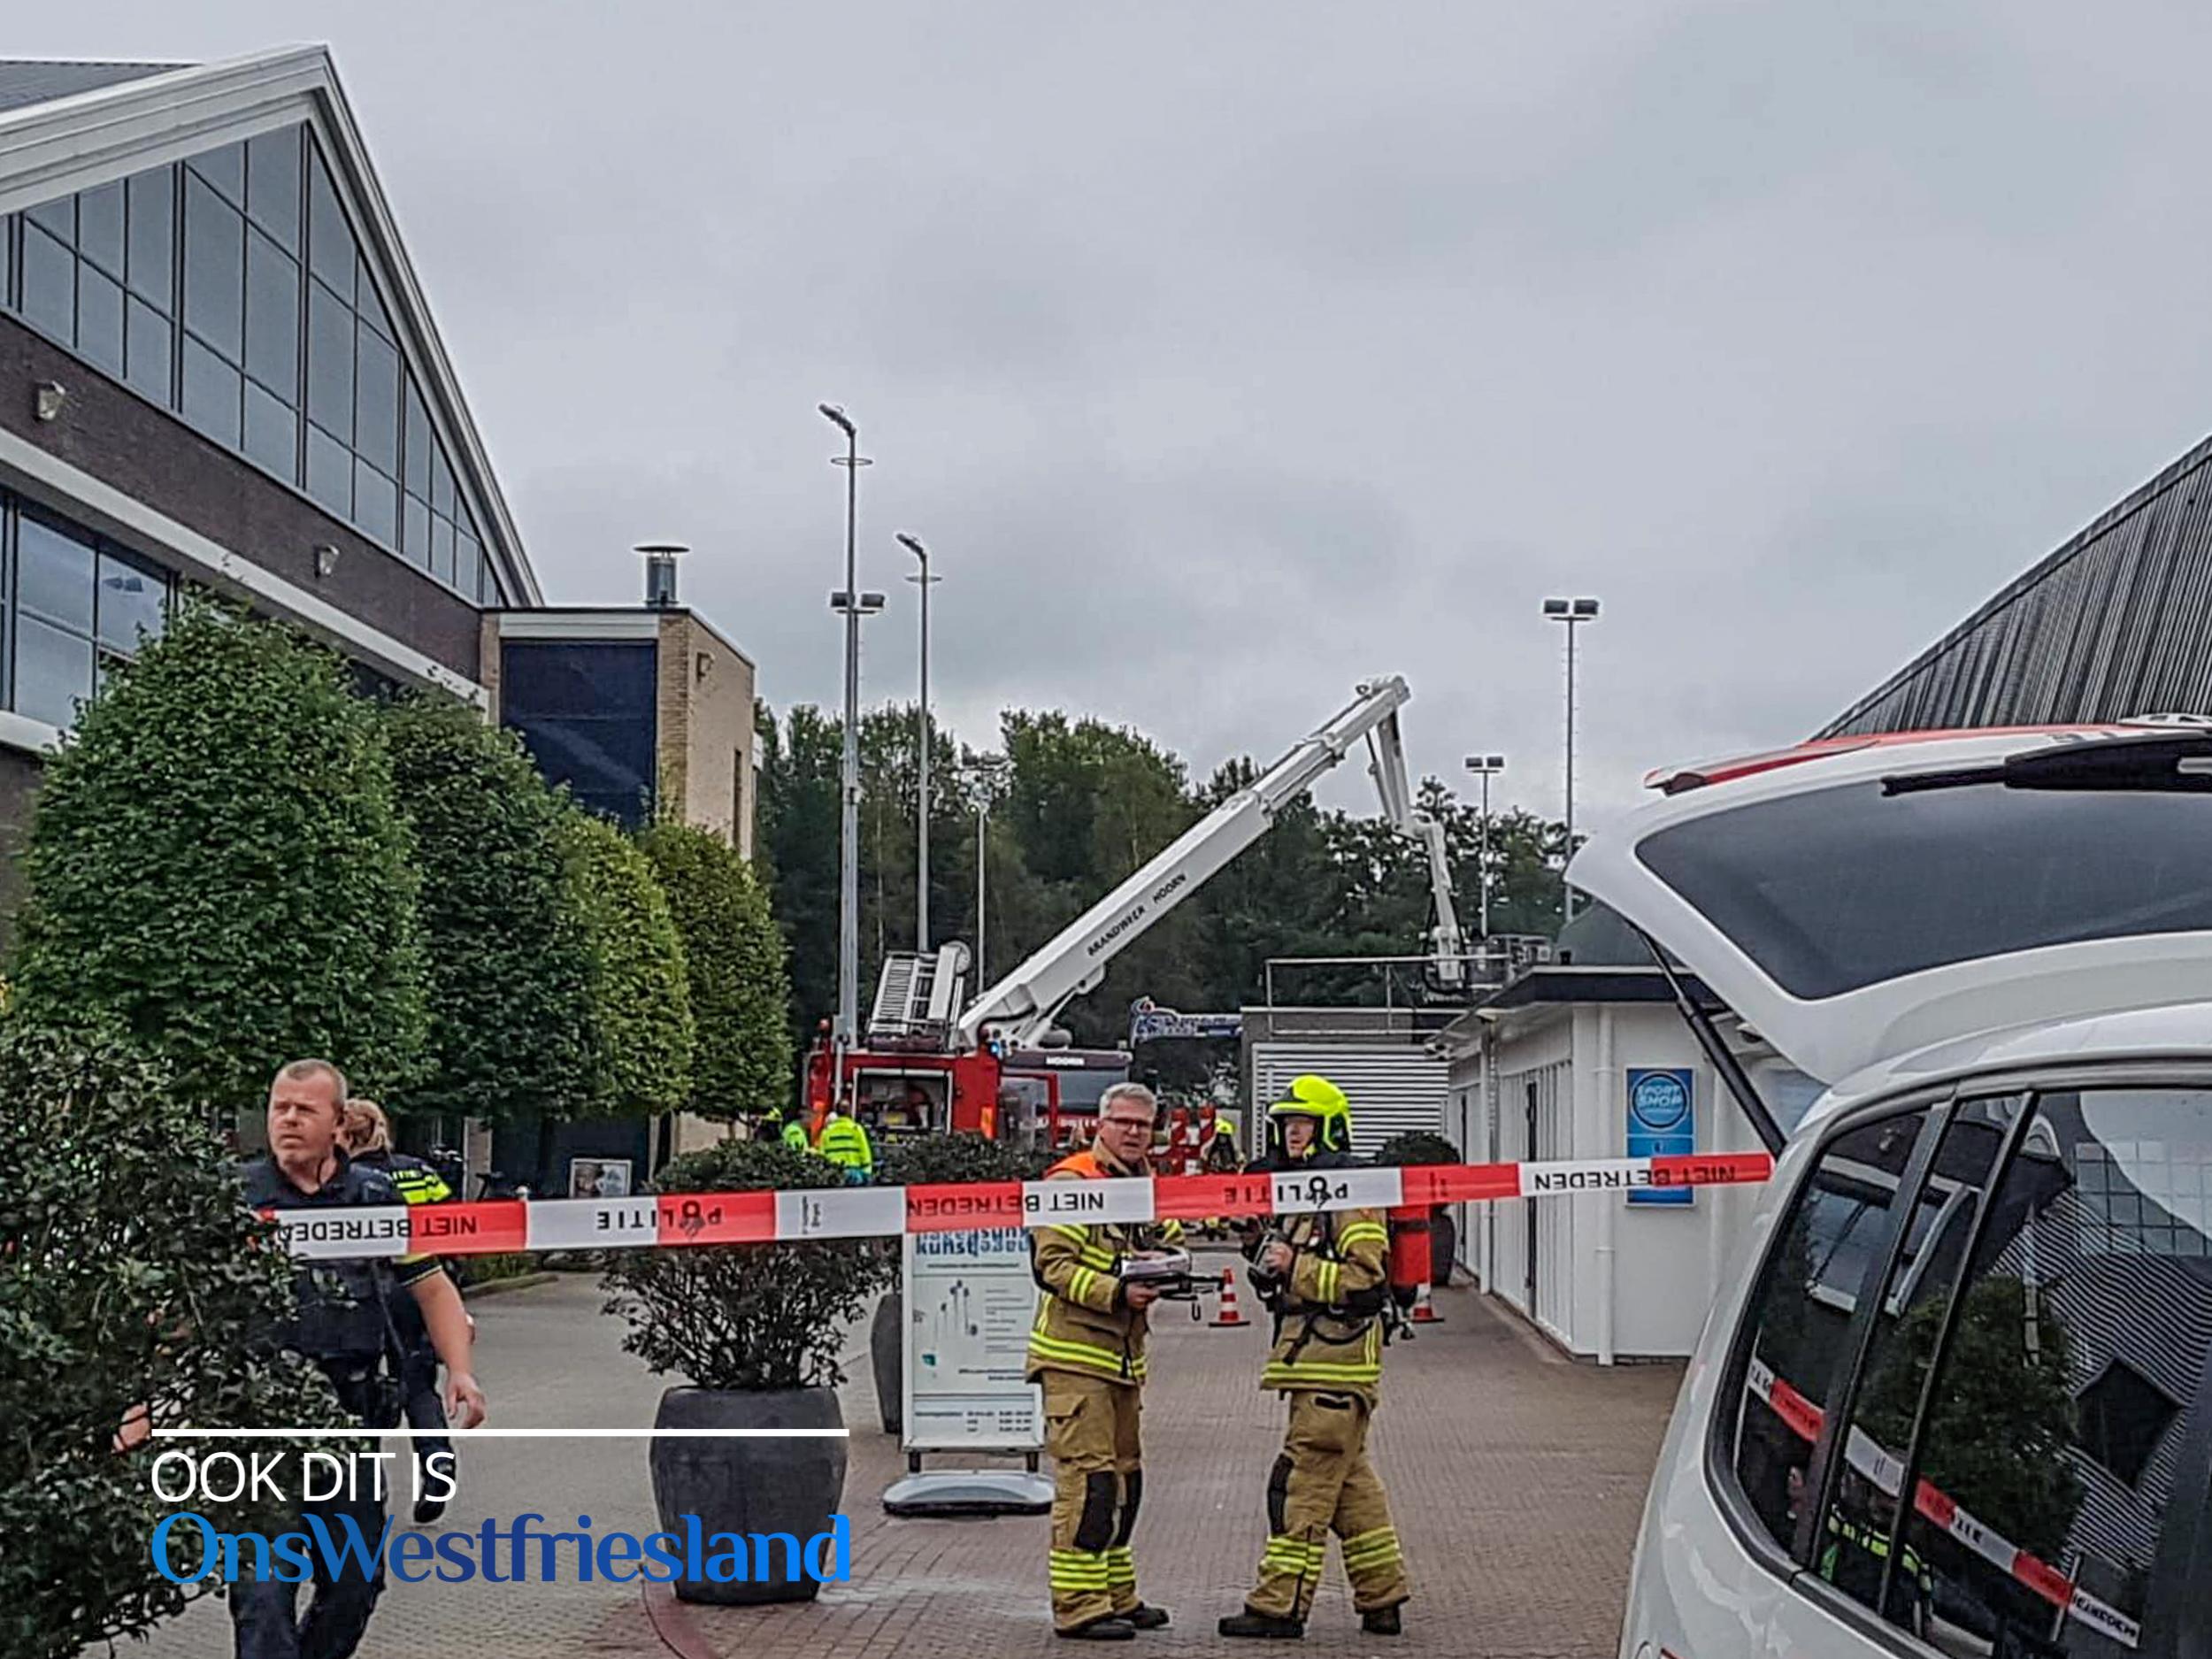 Sportcentrum Holenweg Hoorn ontruimd na brandmelding